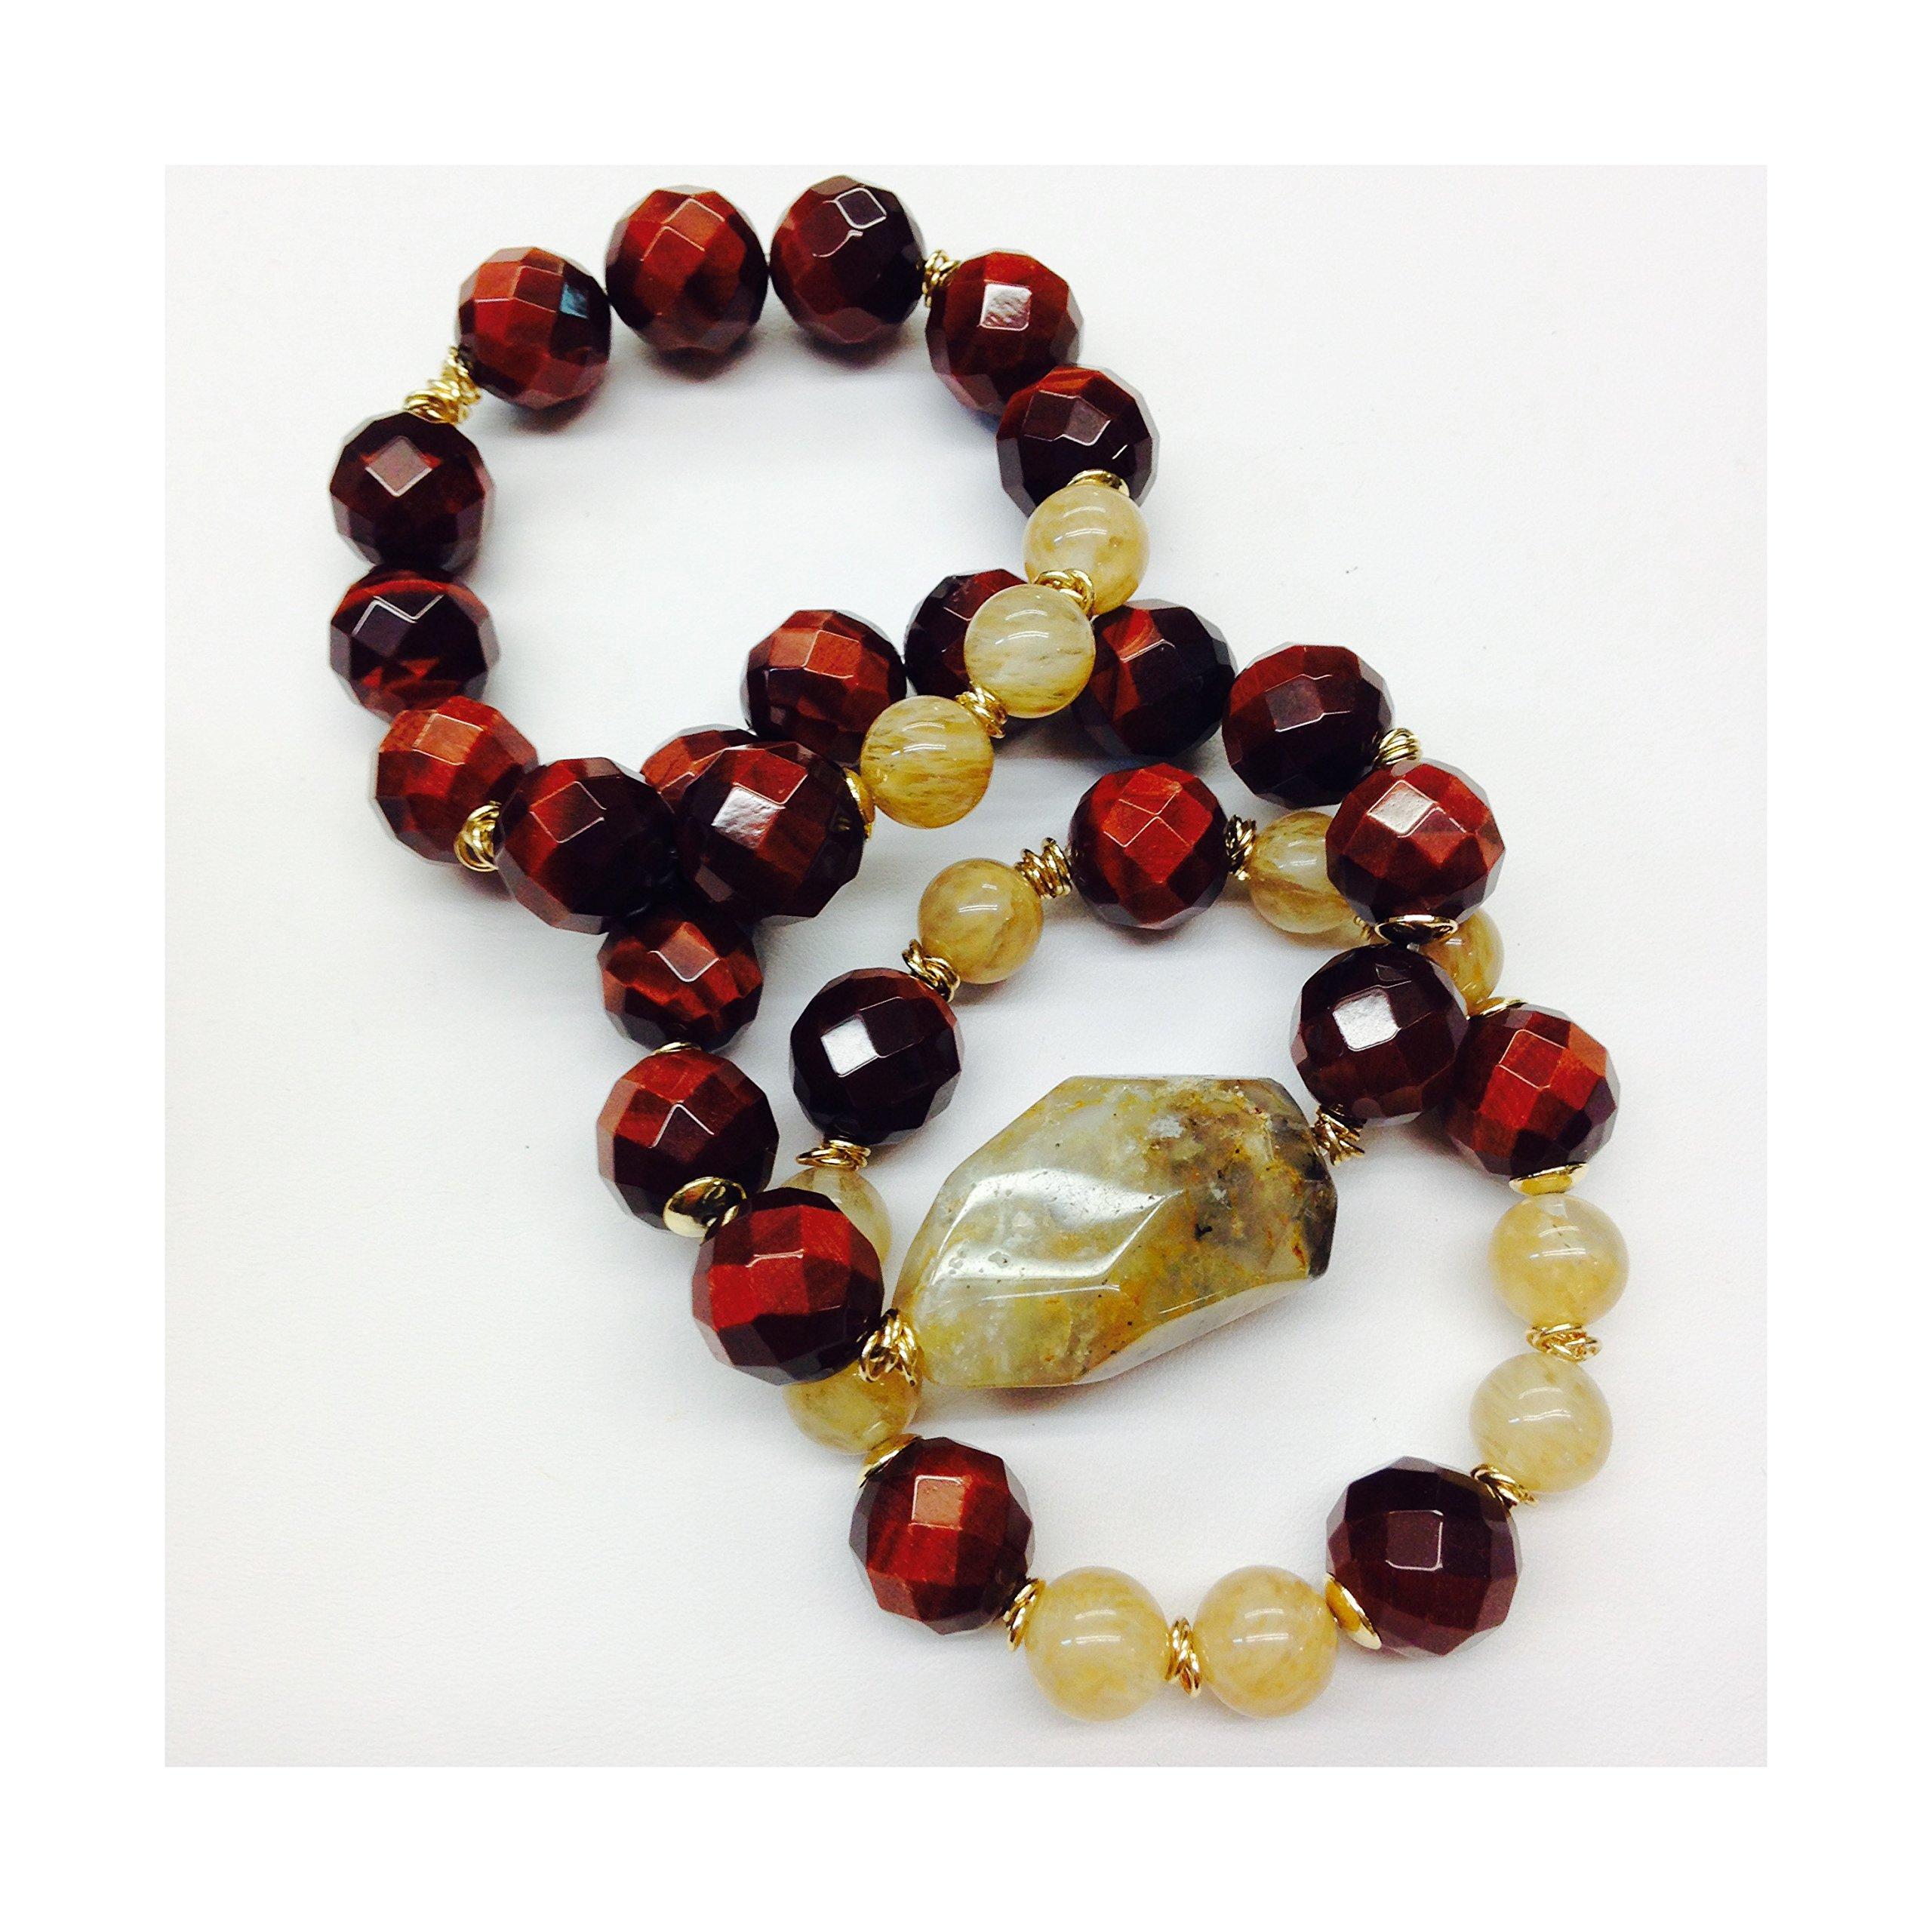 Set of 3 Handmade Bracelets - Red Tiger Eye, Amber Quartz & Citrine Natural Stones & Goldfilled Beads by Formula Moda